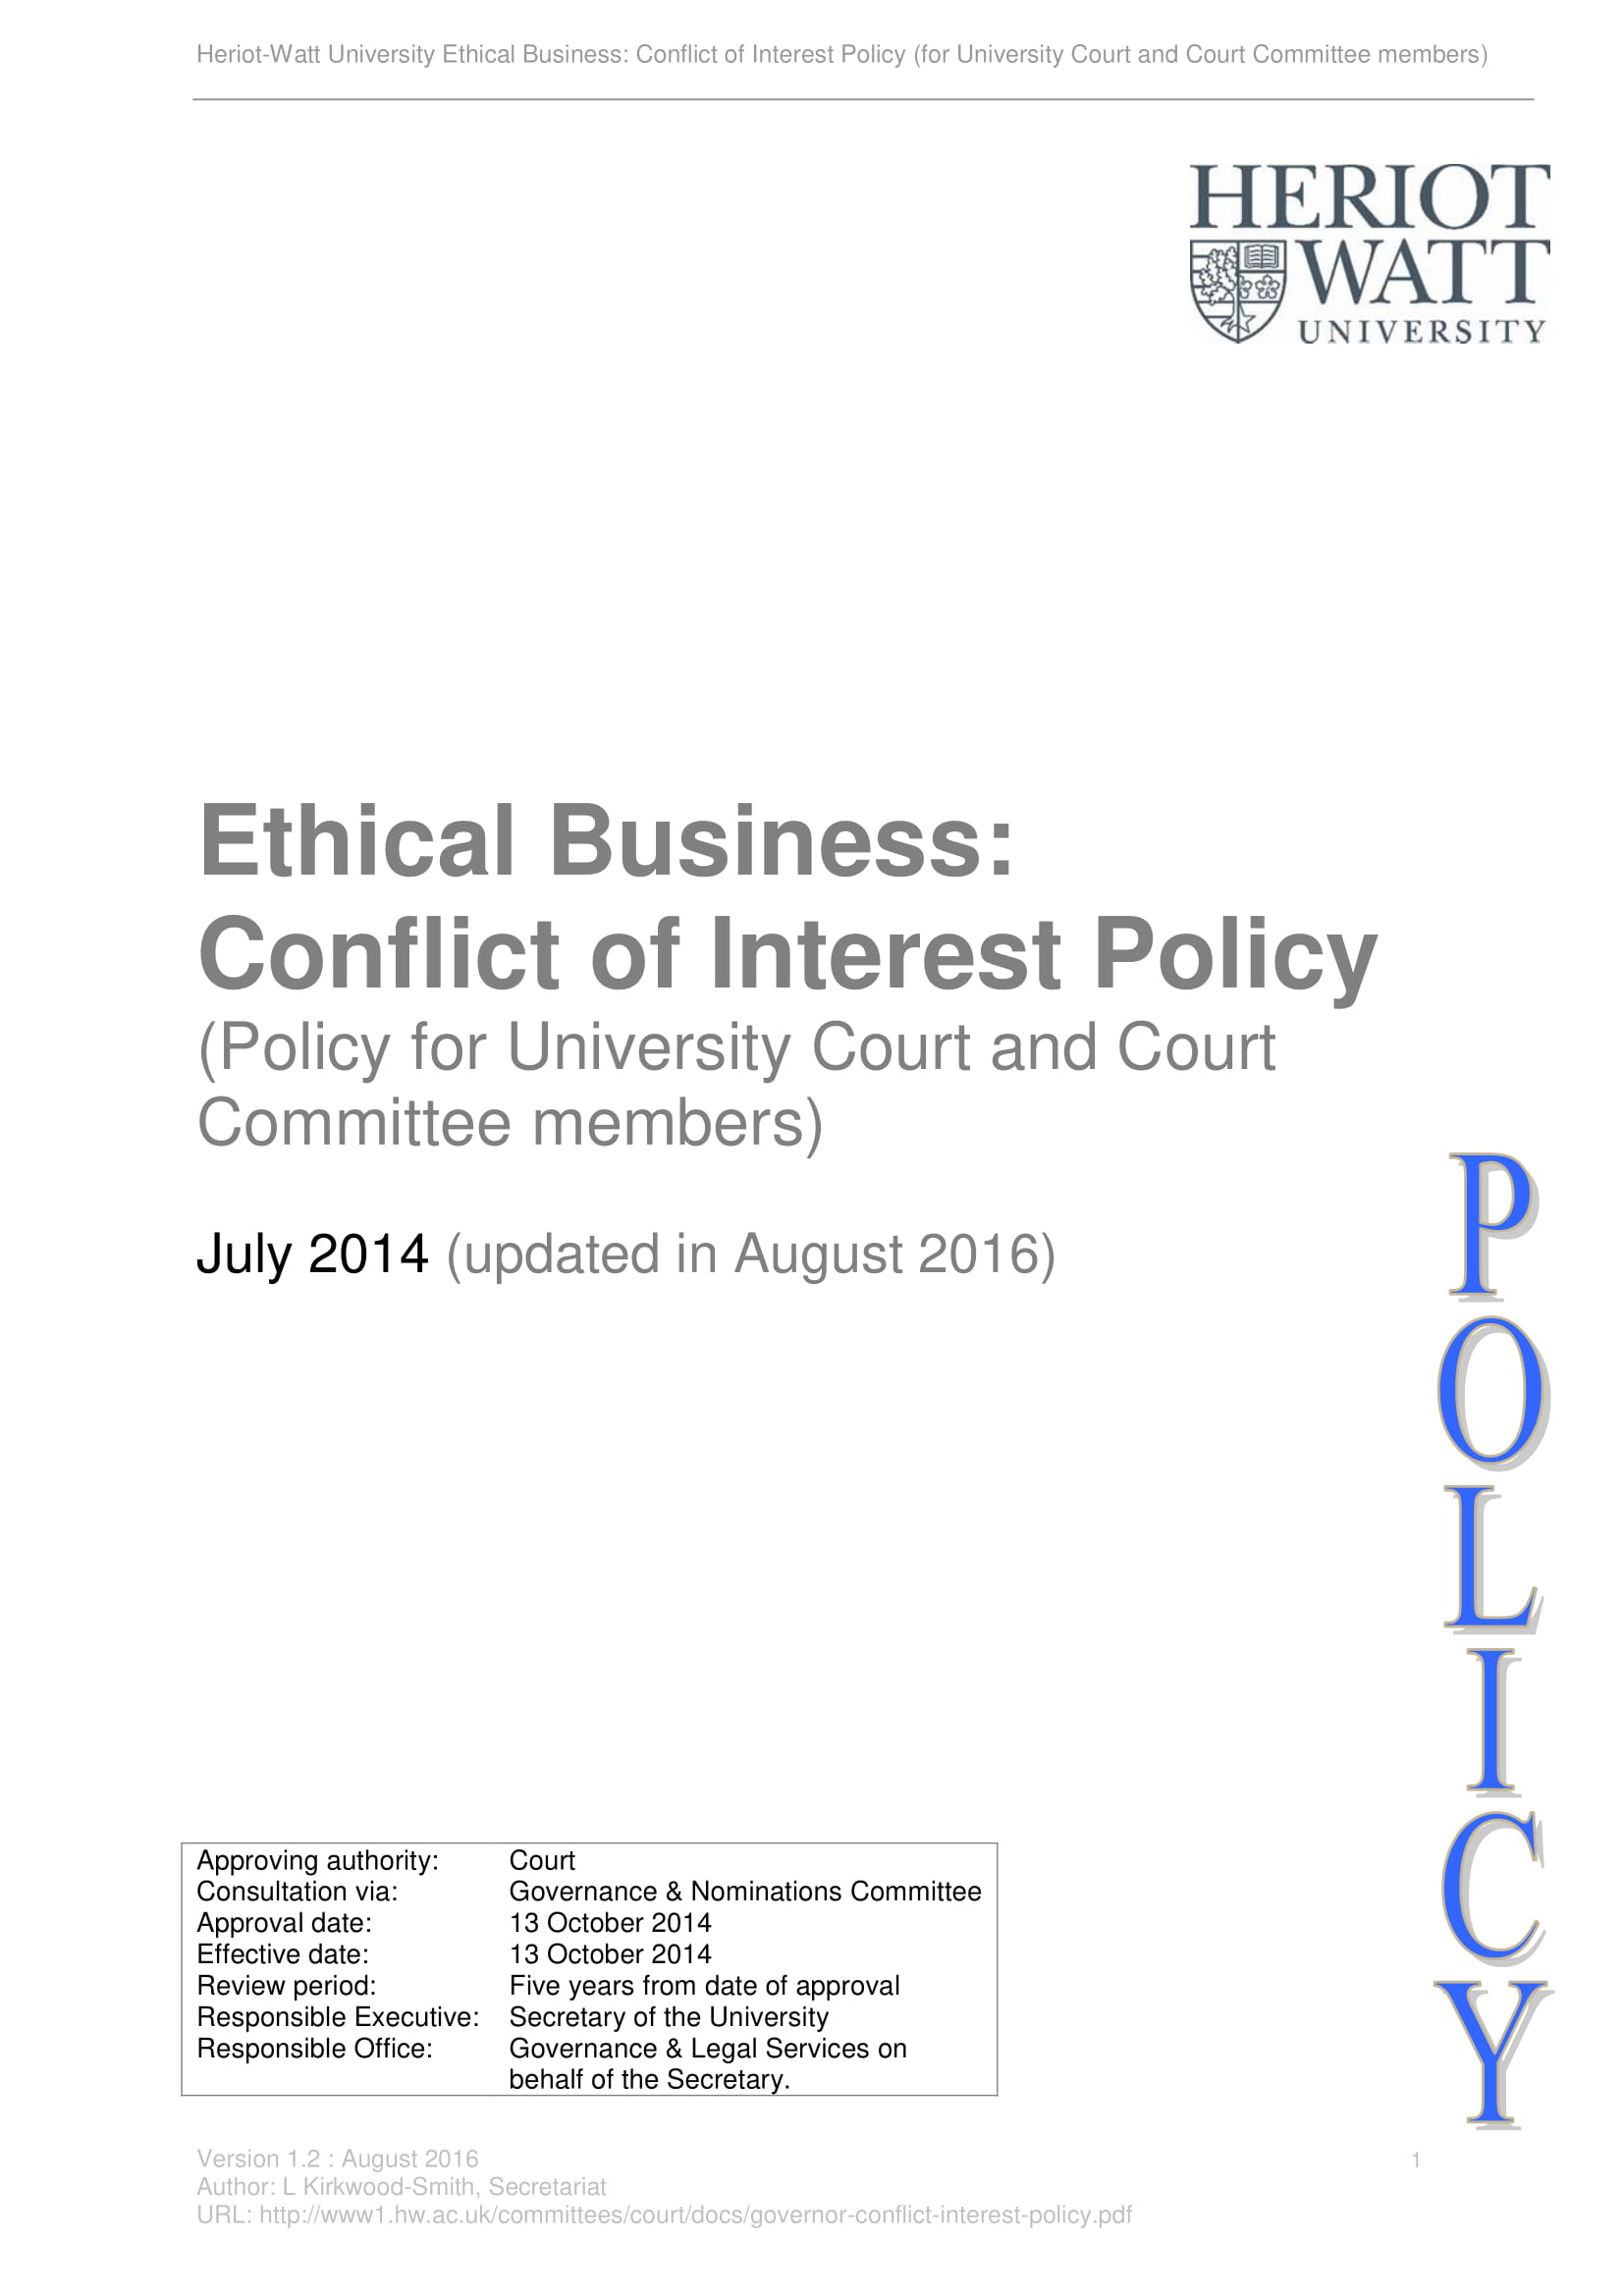 ethicalbusinessconflictofinterestpolicy 01